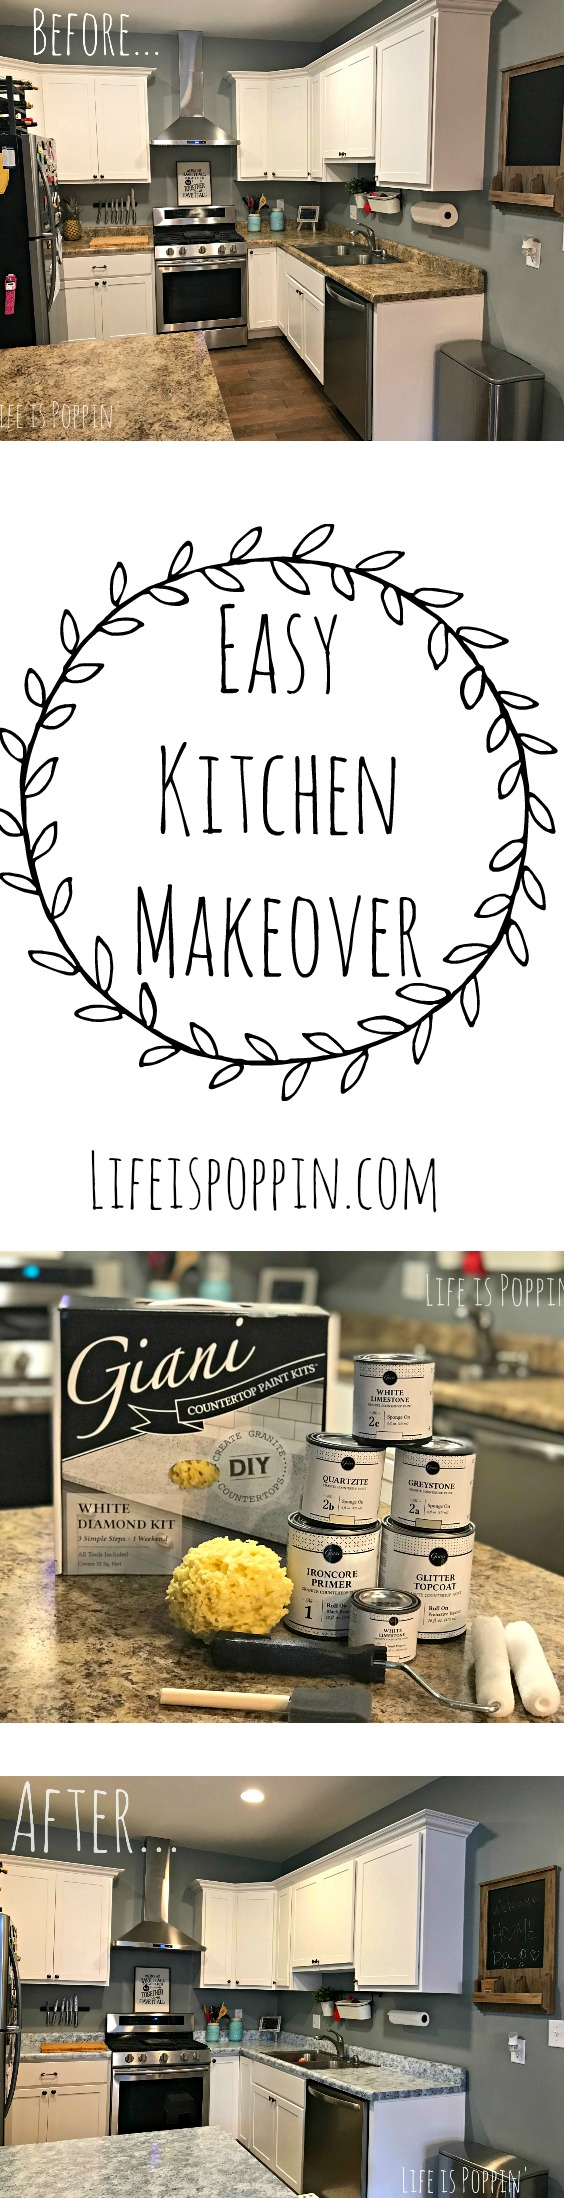 Easy-Kitchen-Makeover